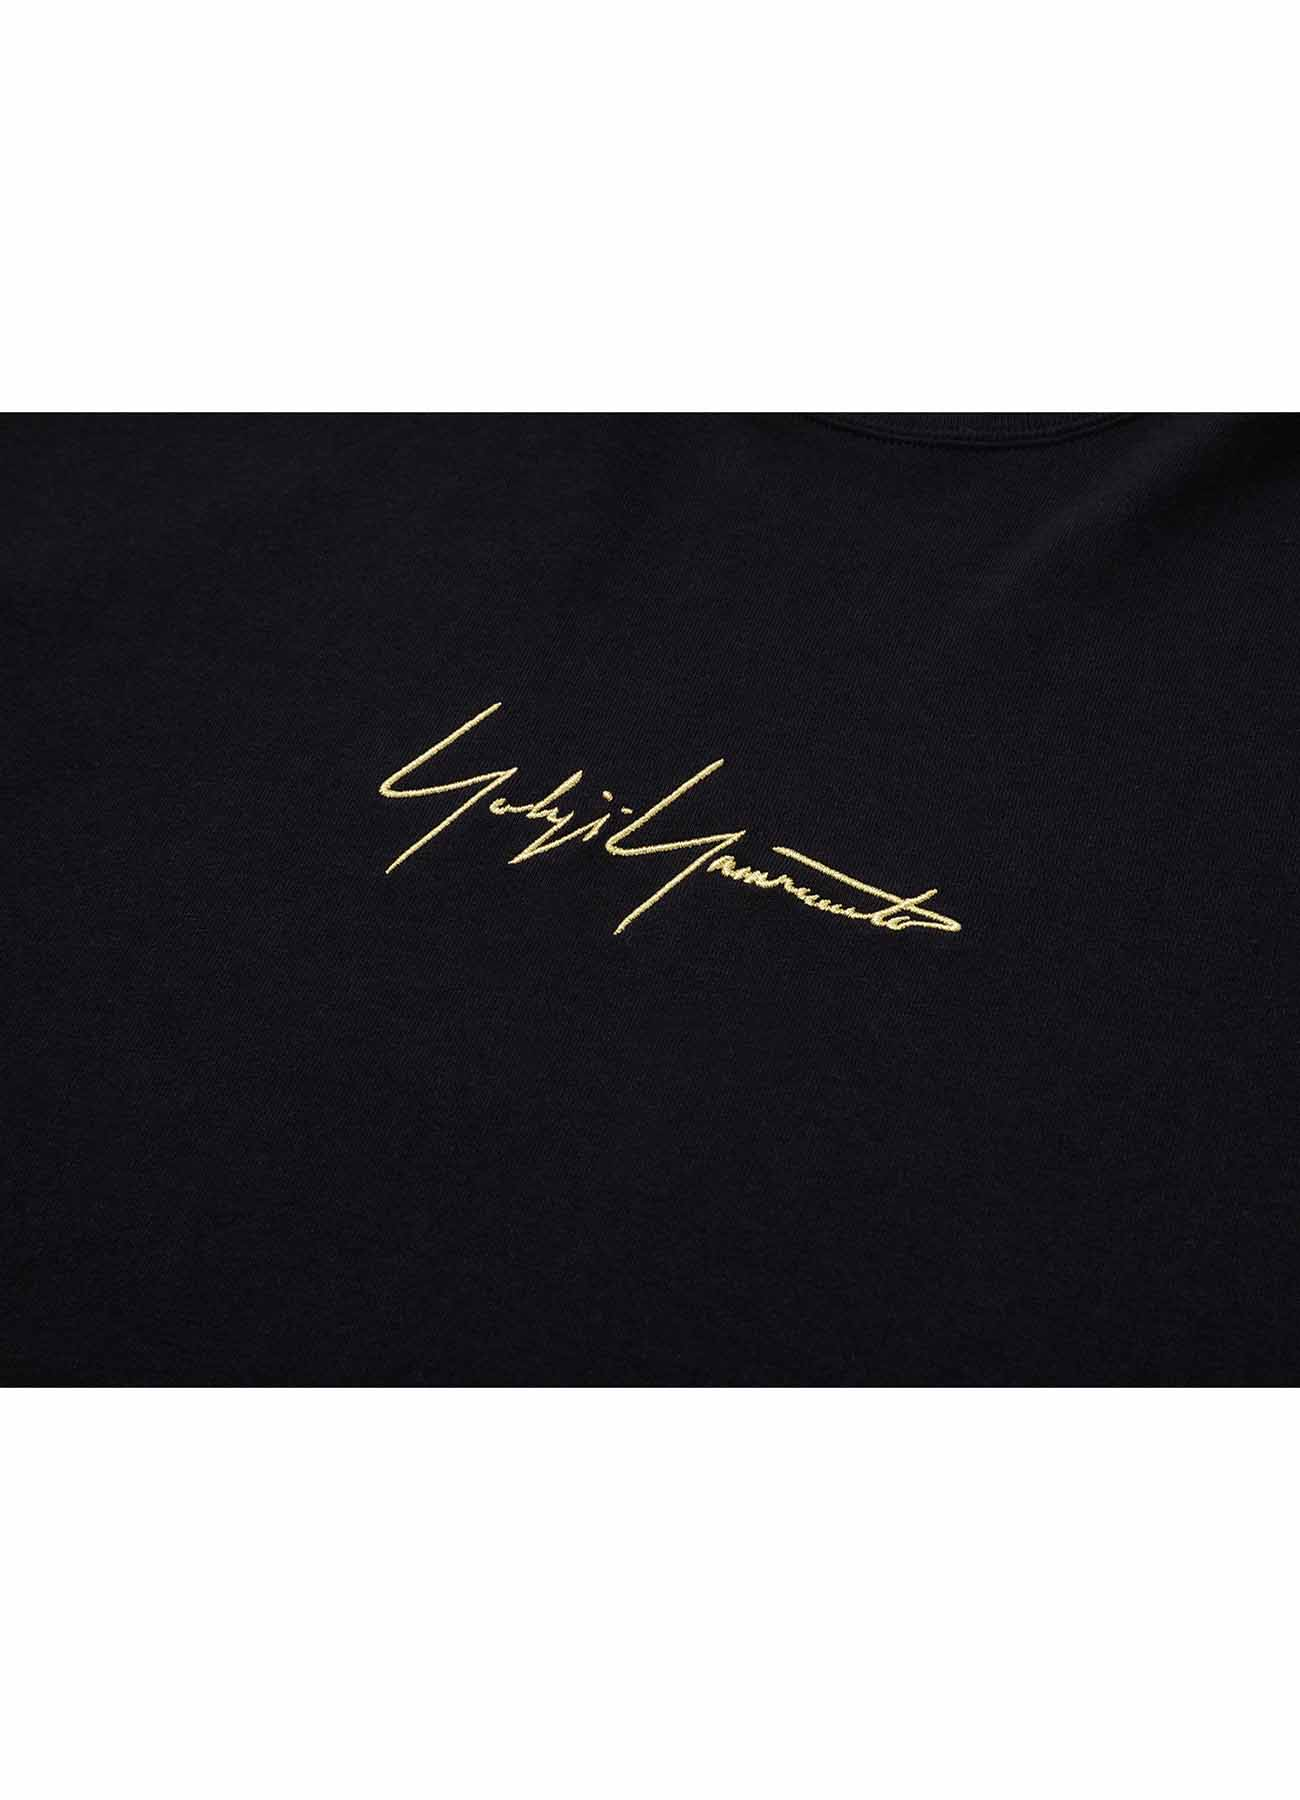 Yohji Yamamoto × New Era METALLIC GOLD SIGNATURE SS TEE